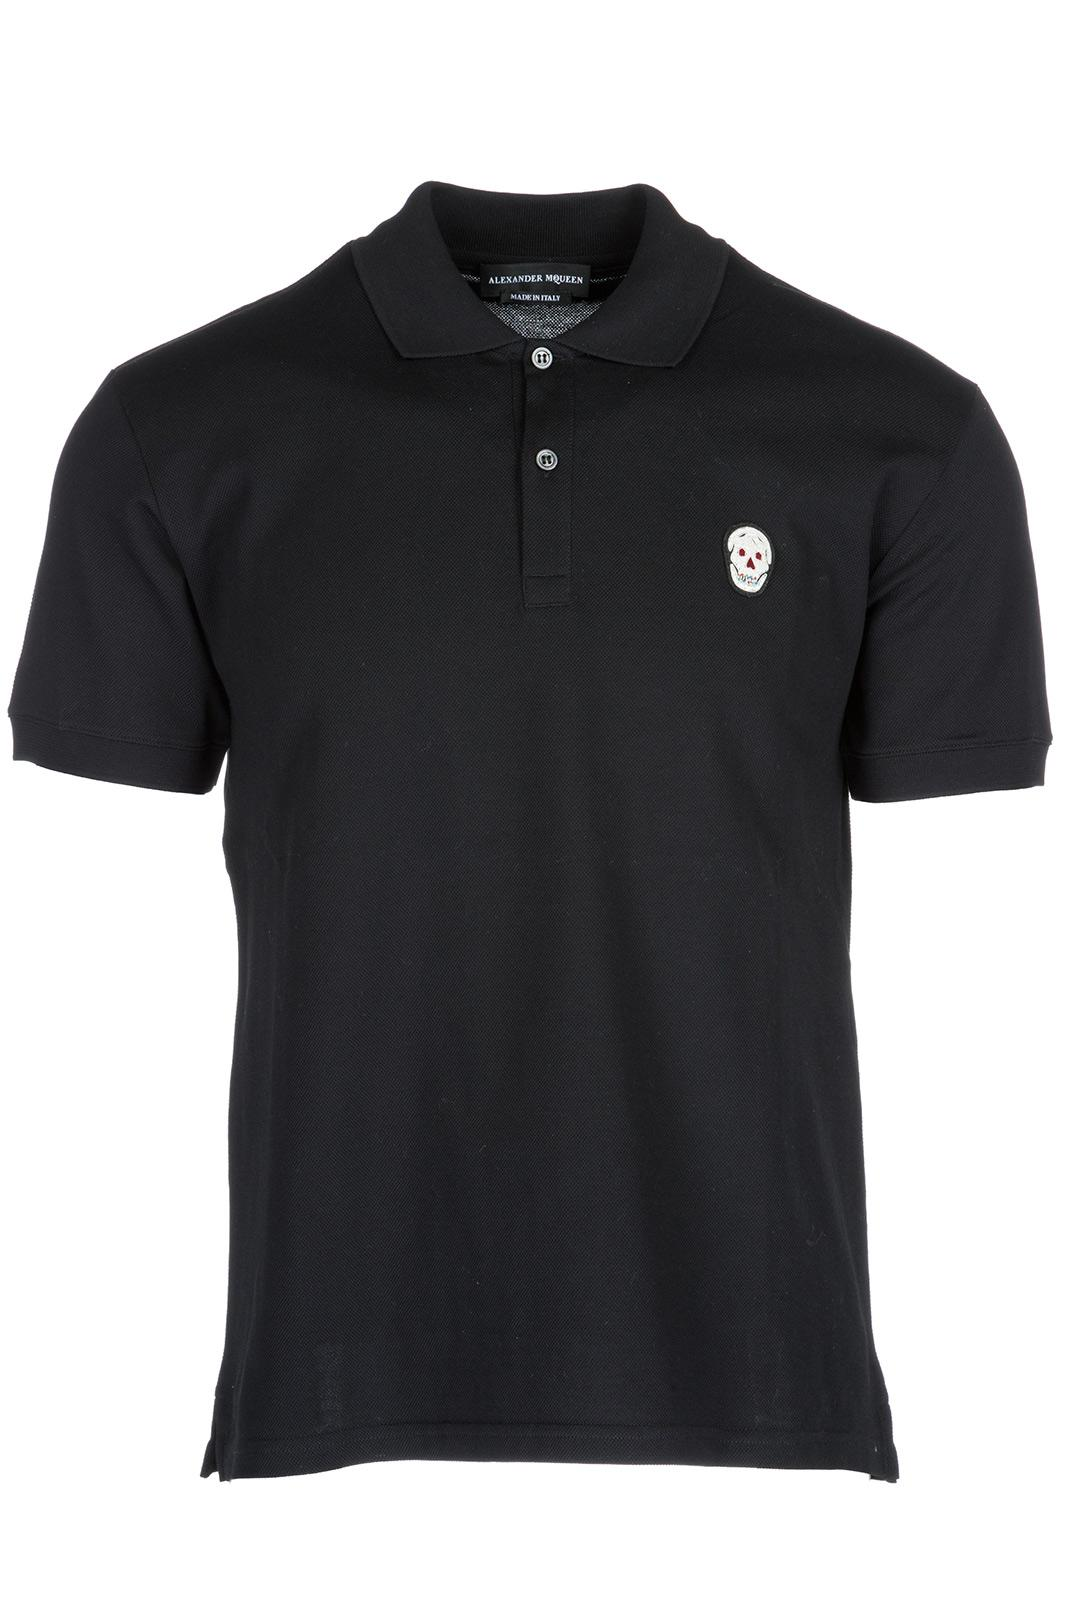 Alexander Mcqueen Men's Short Sleeve T-shirt Polo Collar In Black